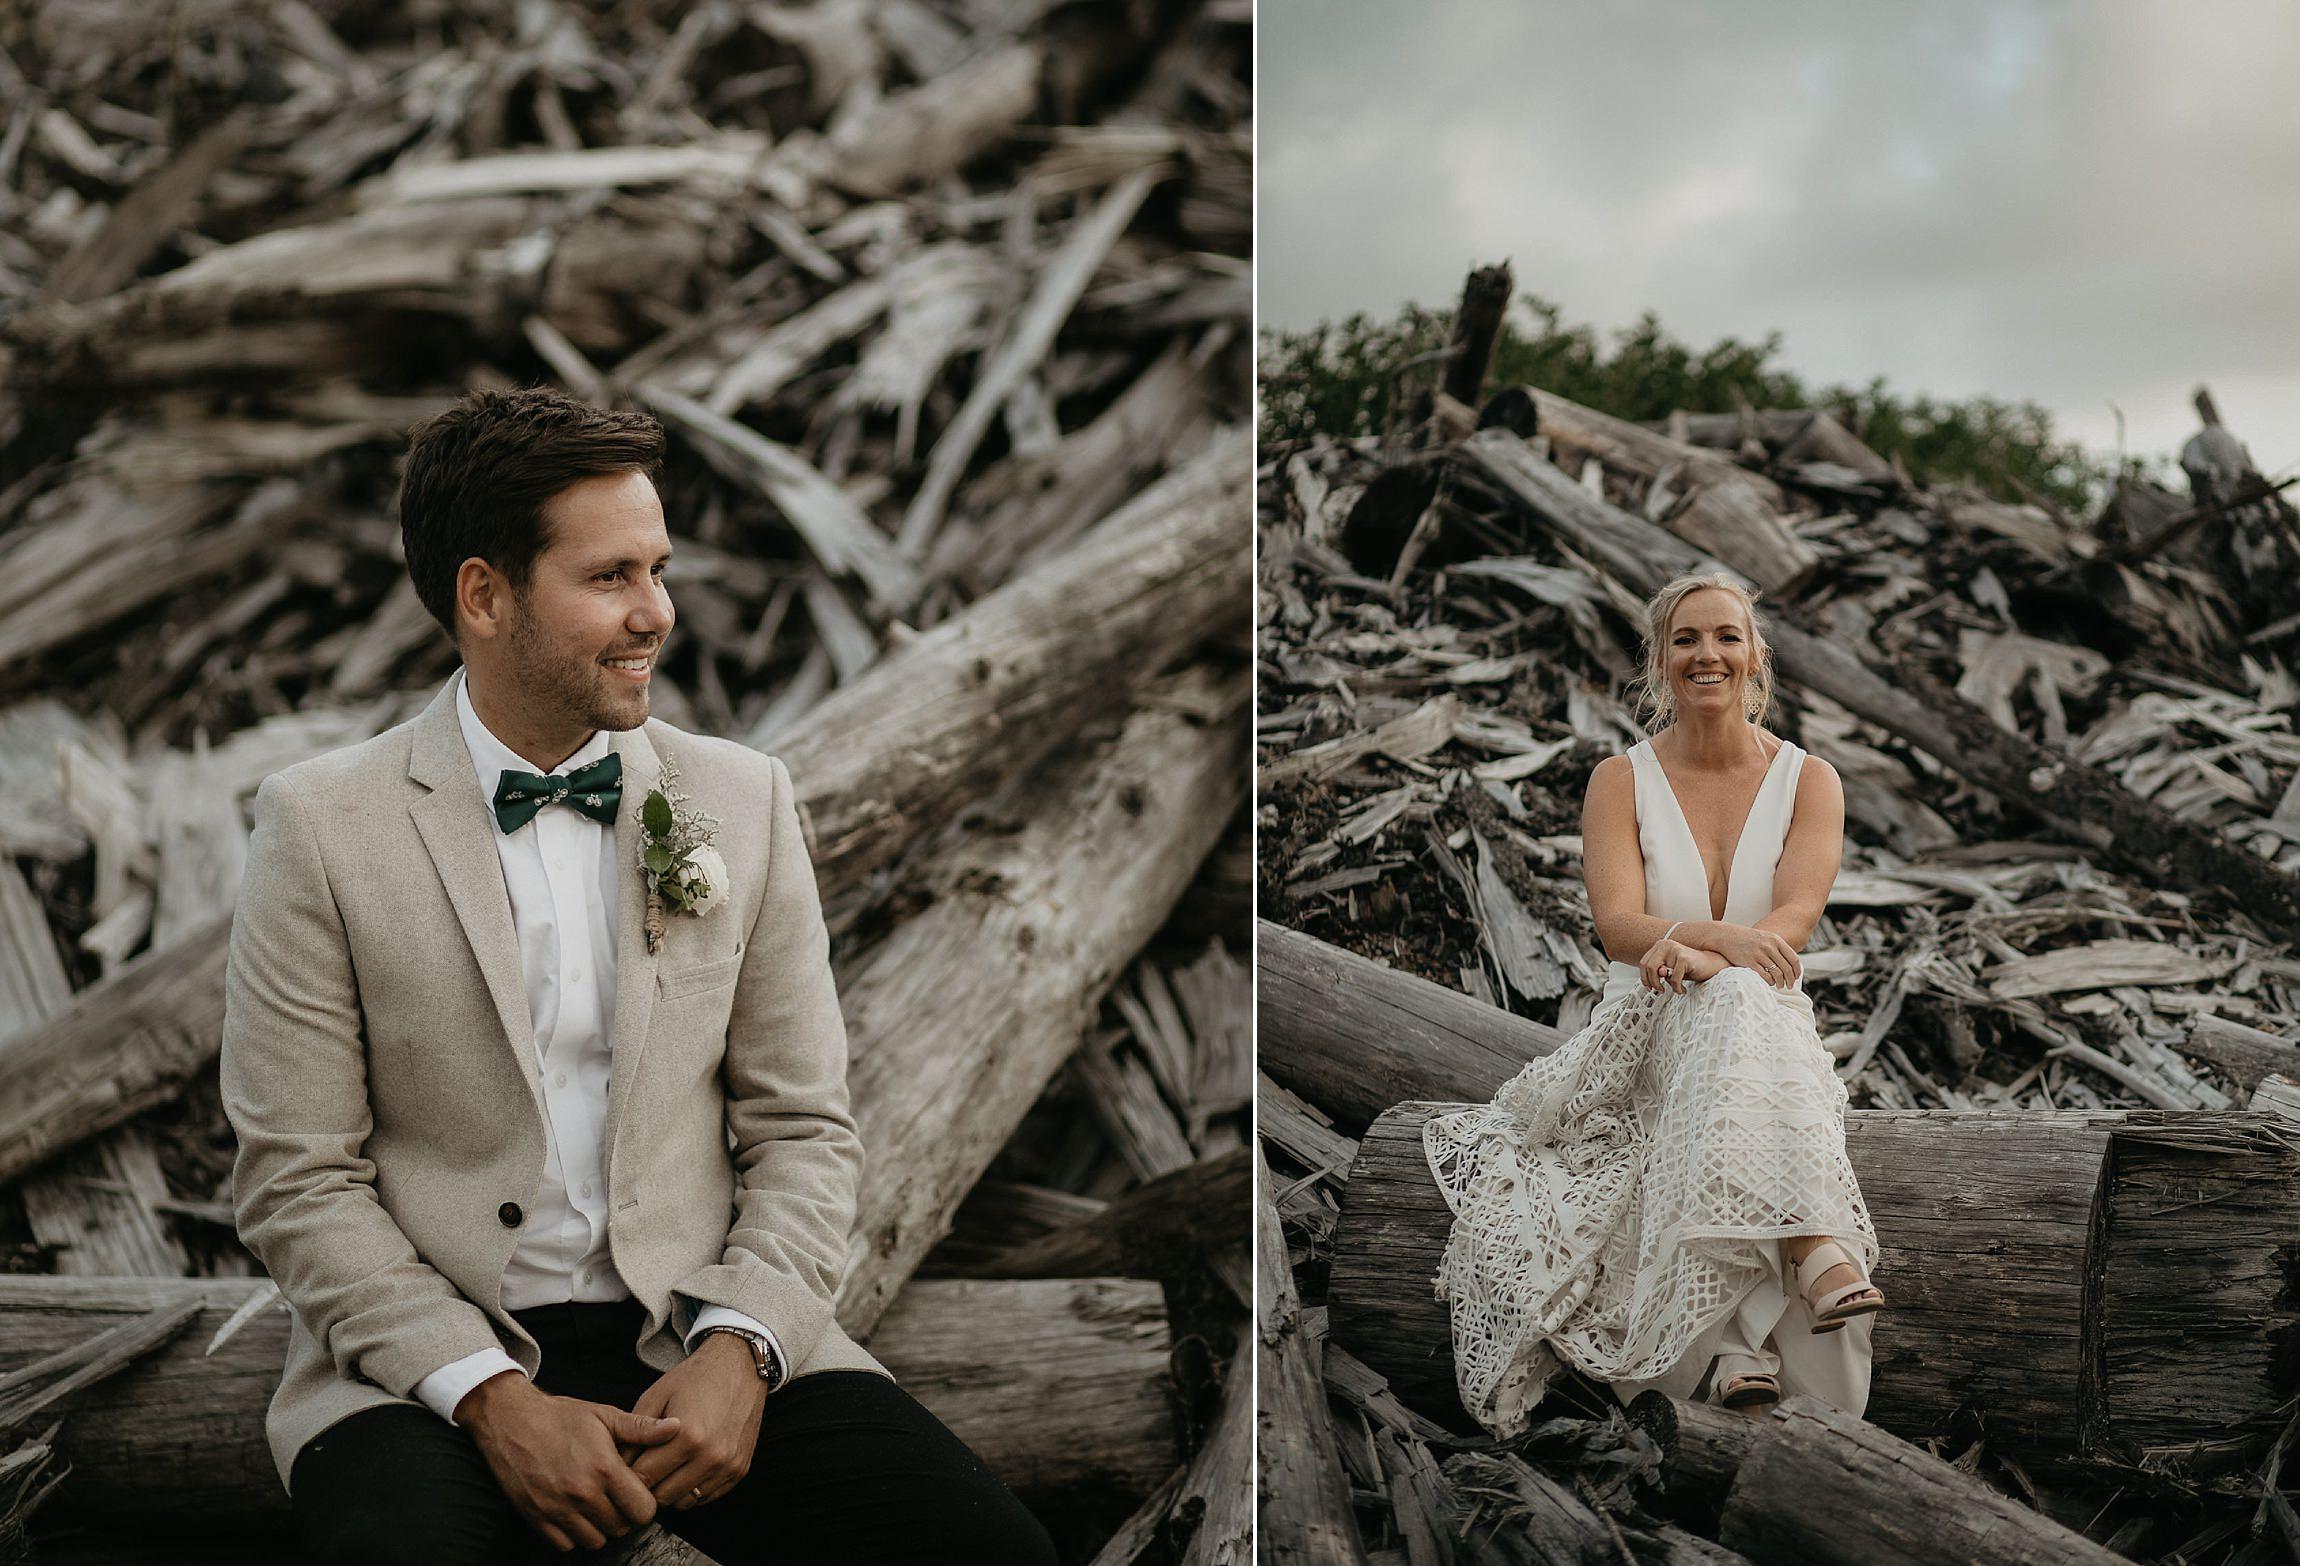 oldforestschool-wedding-blog-168.jpg